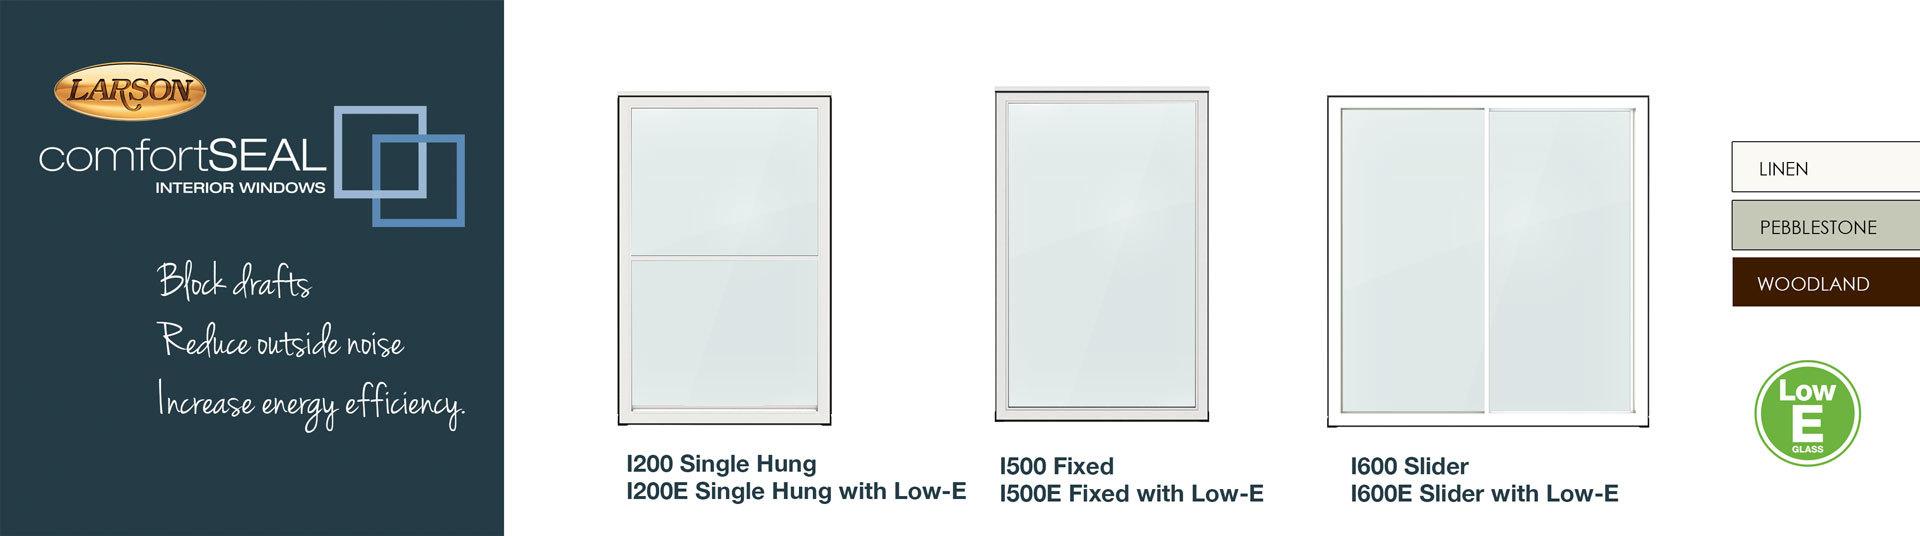 larson comfort seal interior windows.jpeg